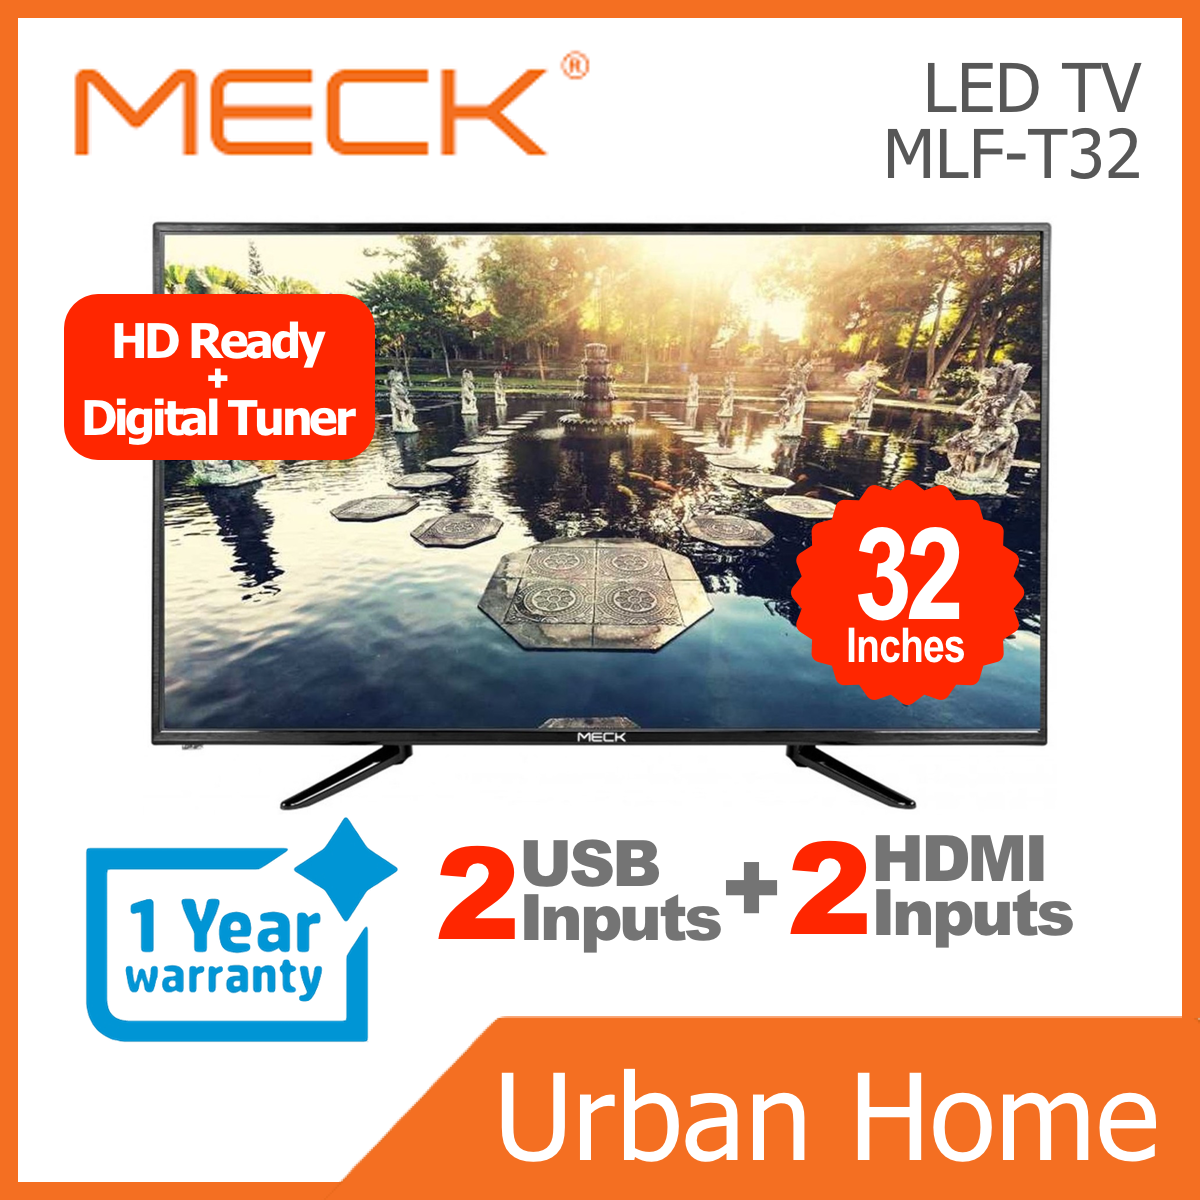 "MECK 32"" Digital Tuner LED TV (MLF-T32/MLFT32)"